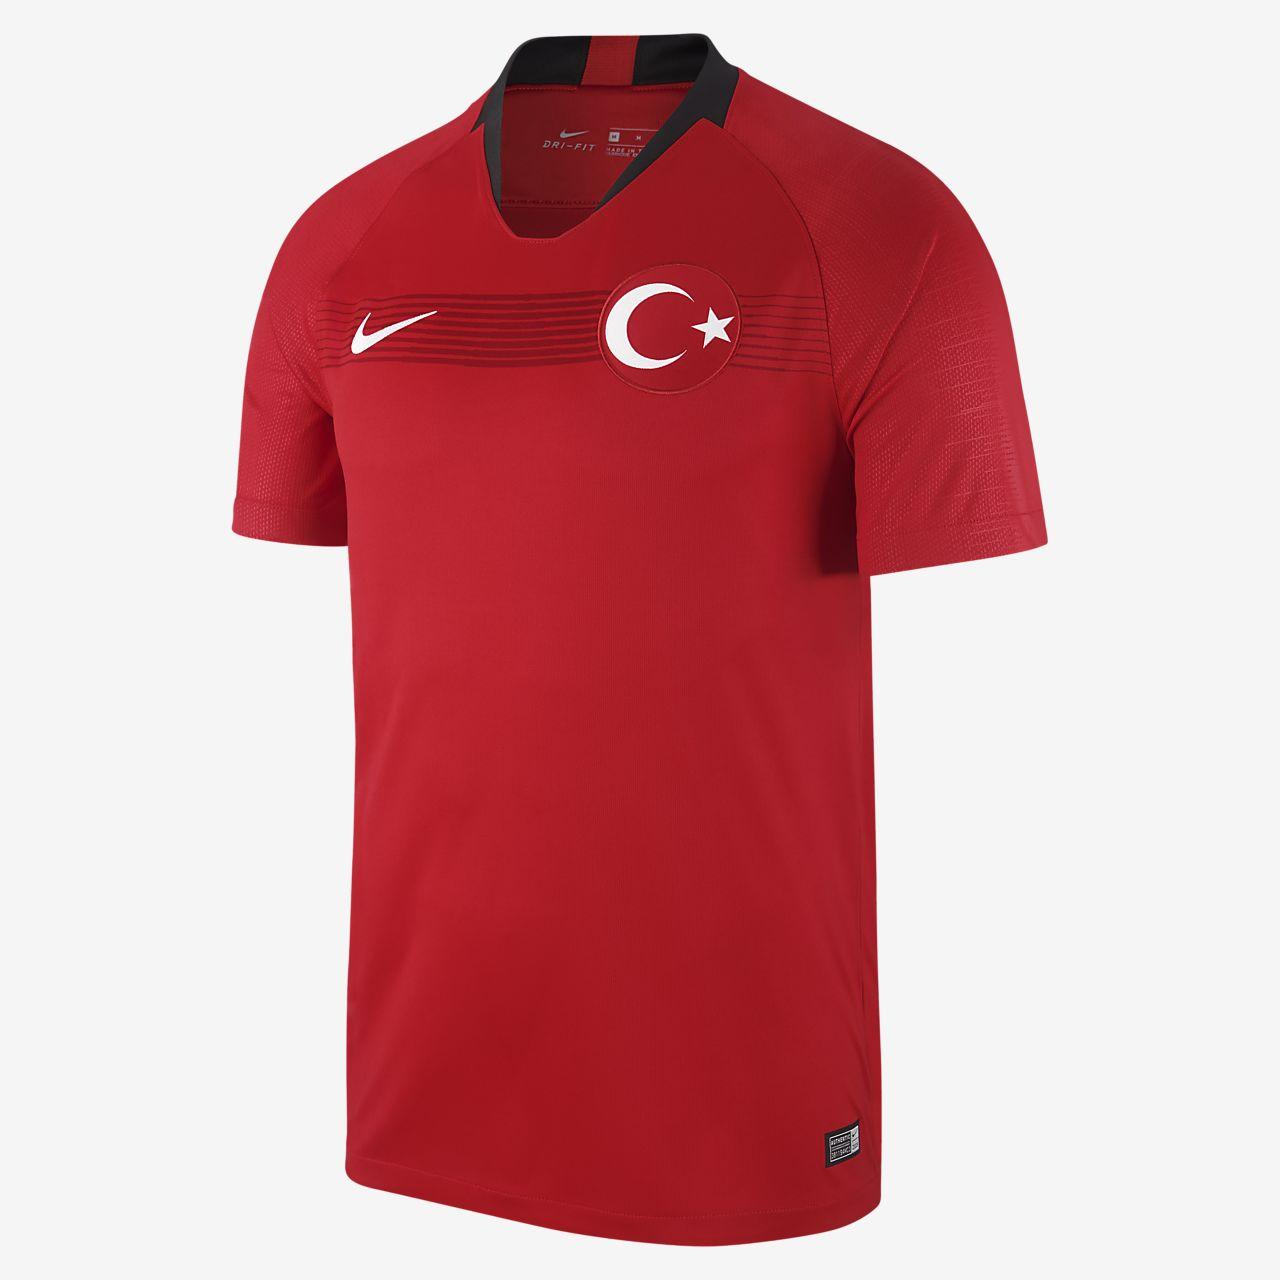 c1b9f415dc0 Camiseta de fútbol para hombre 2018 Turkey Stadium Home/Away. Nike ...